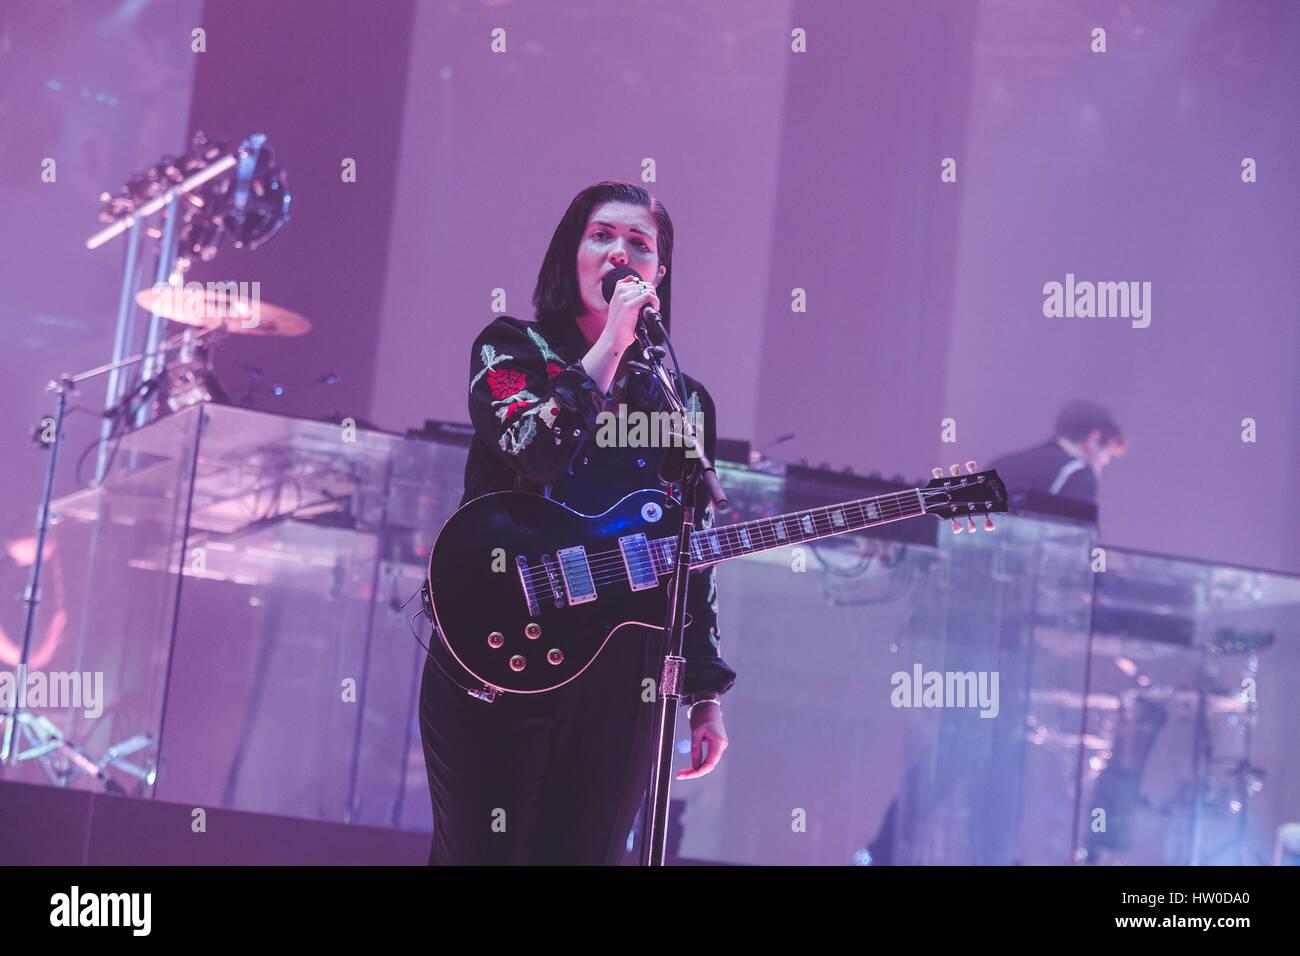 London, UK. March 15, 2017 - Romy Madley Croft, of the British band ...